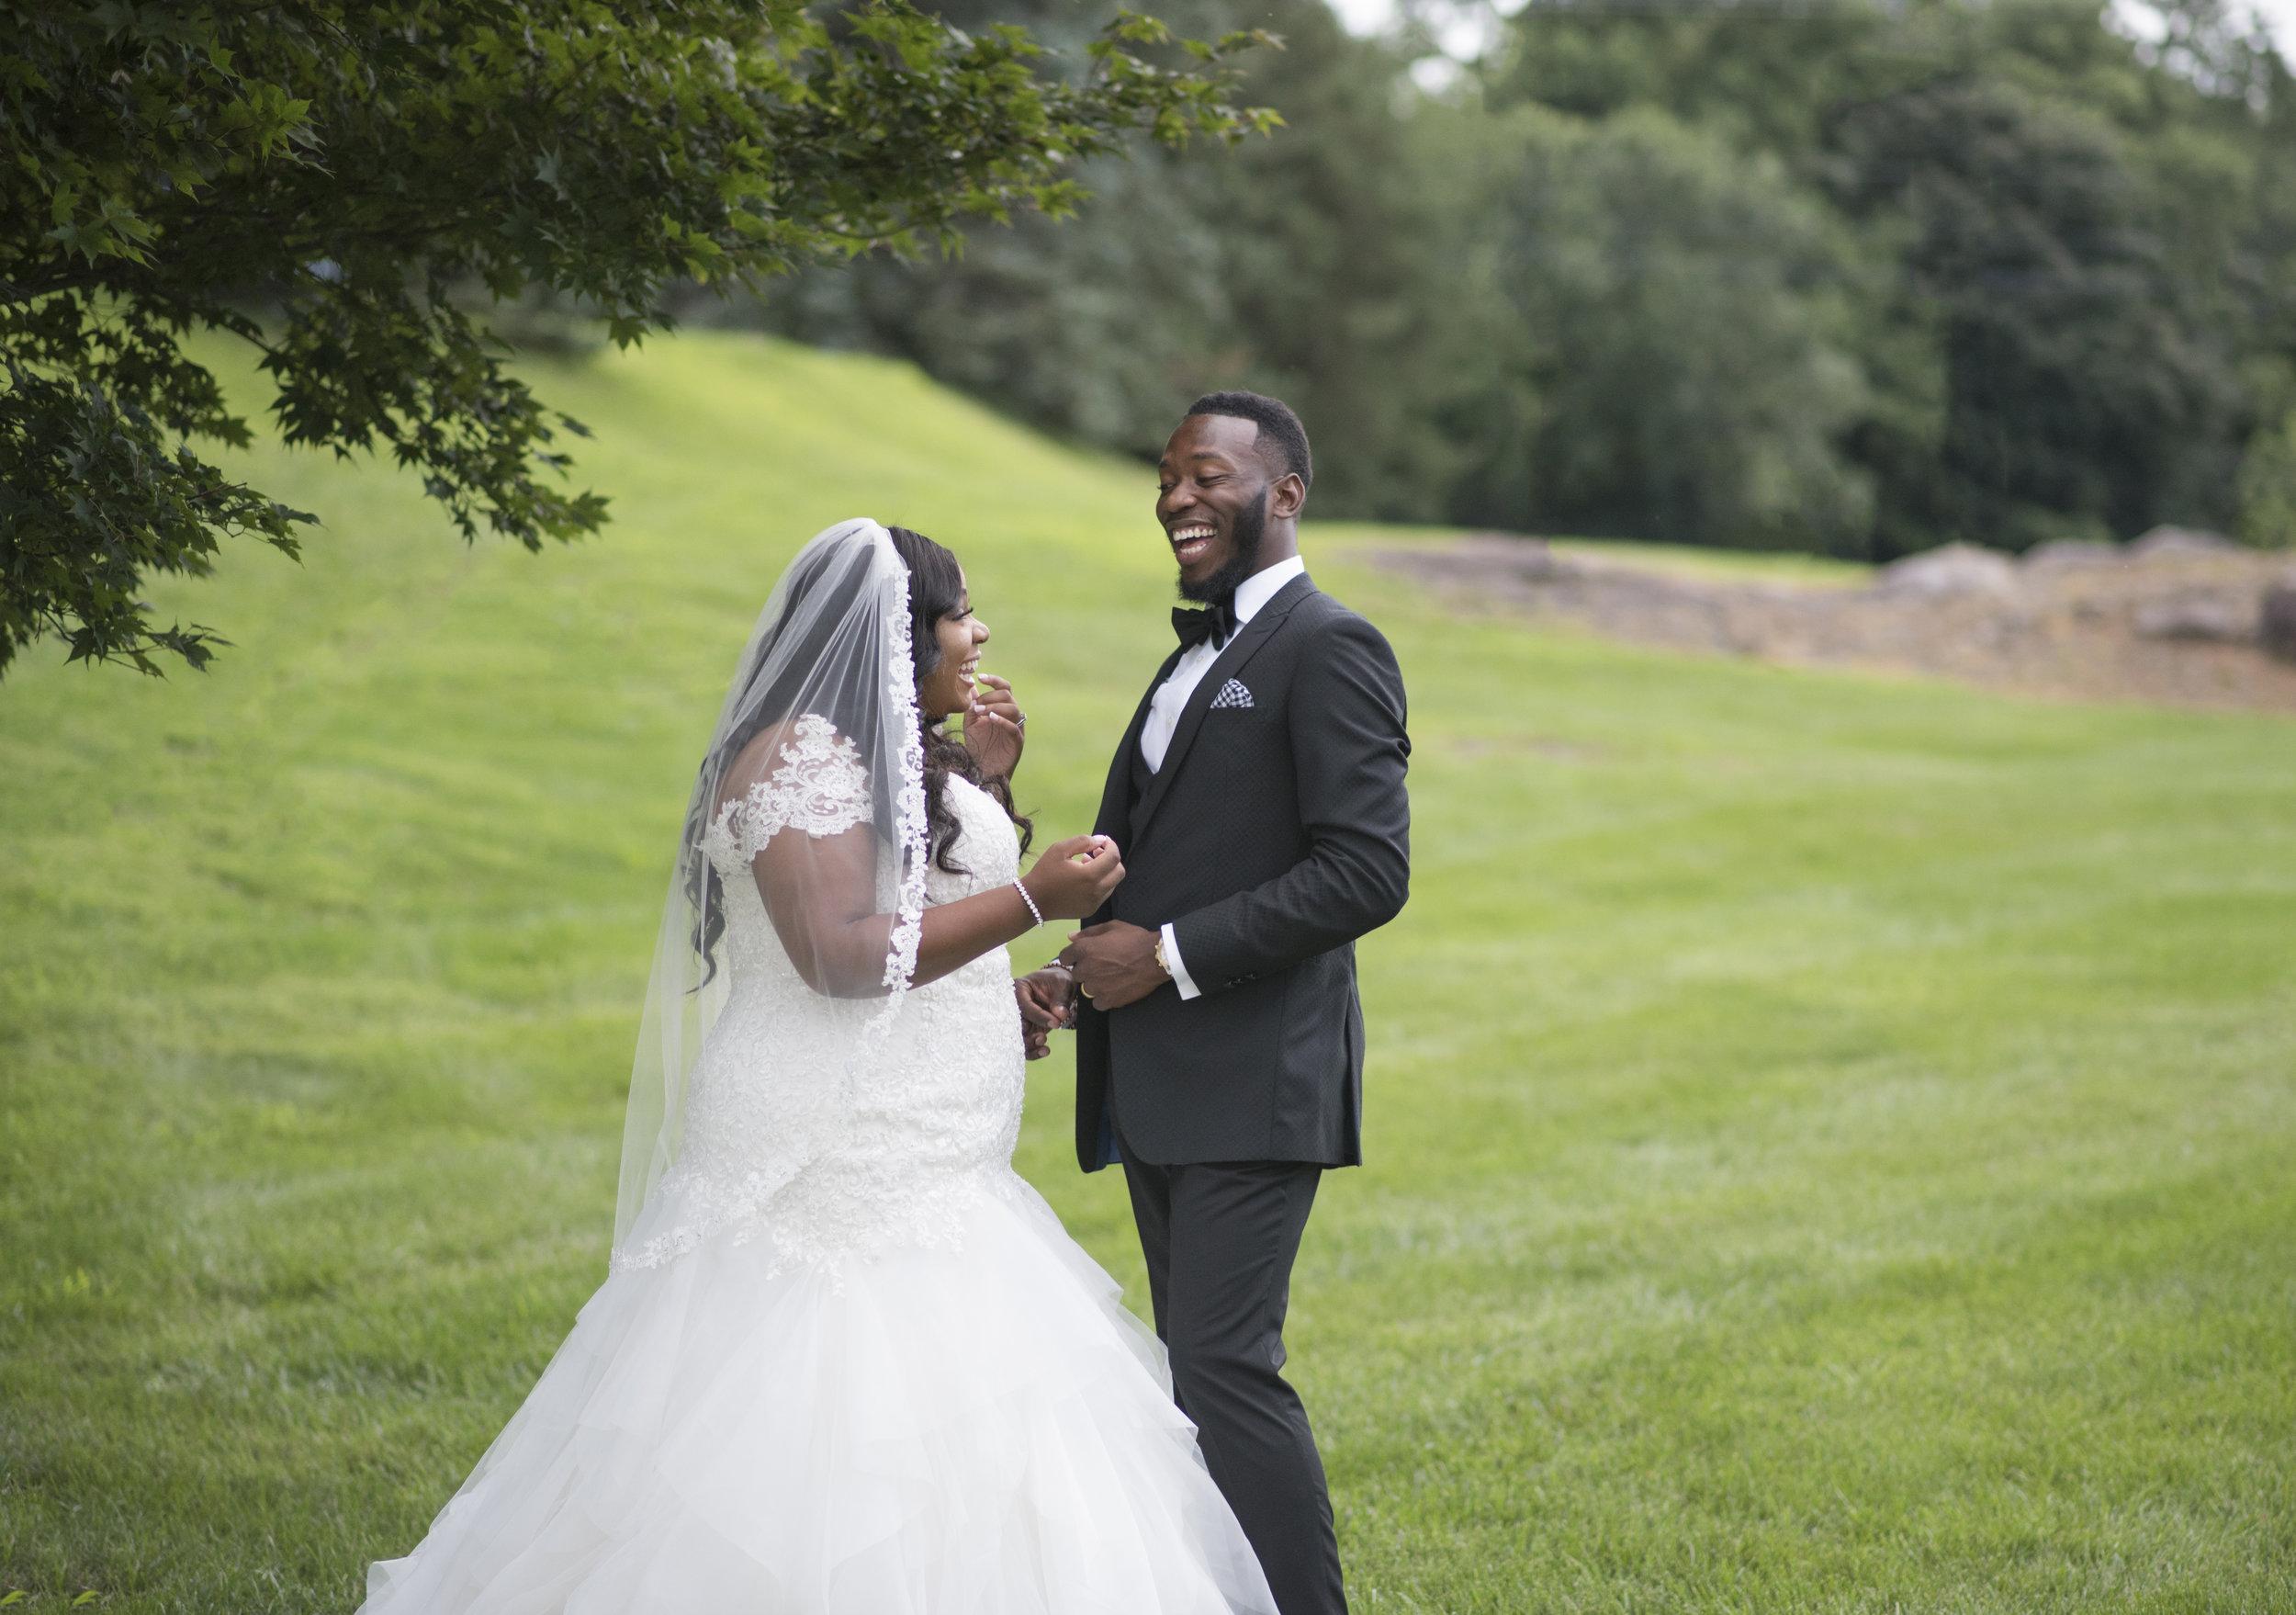 south-jersey-wedding-photography.jpg